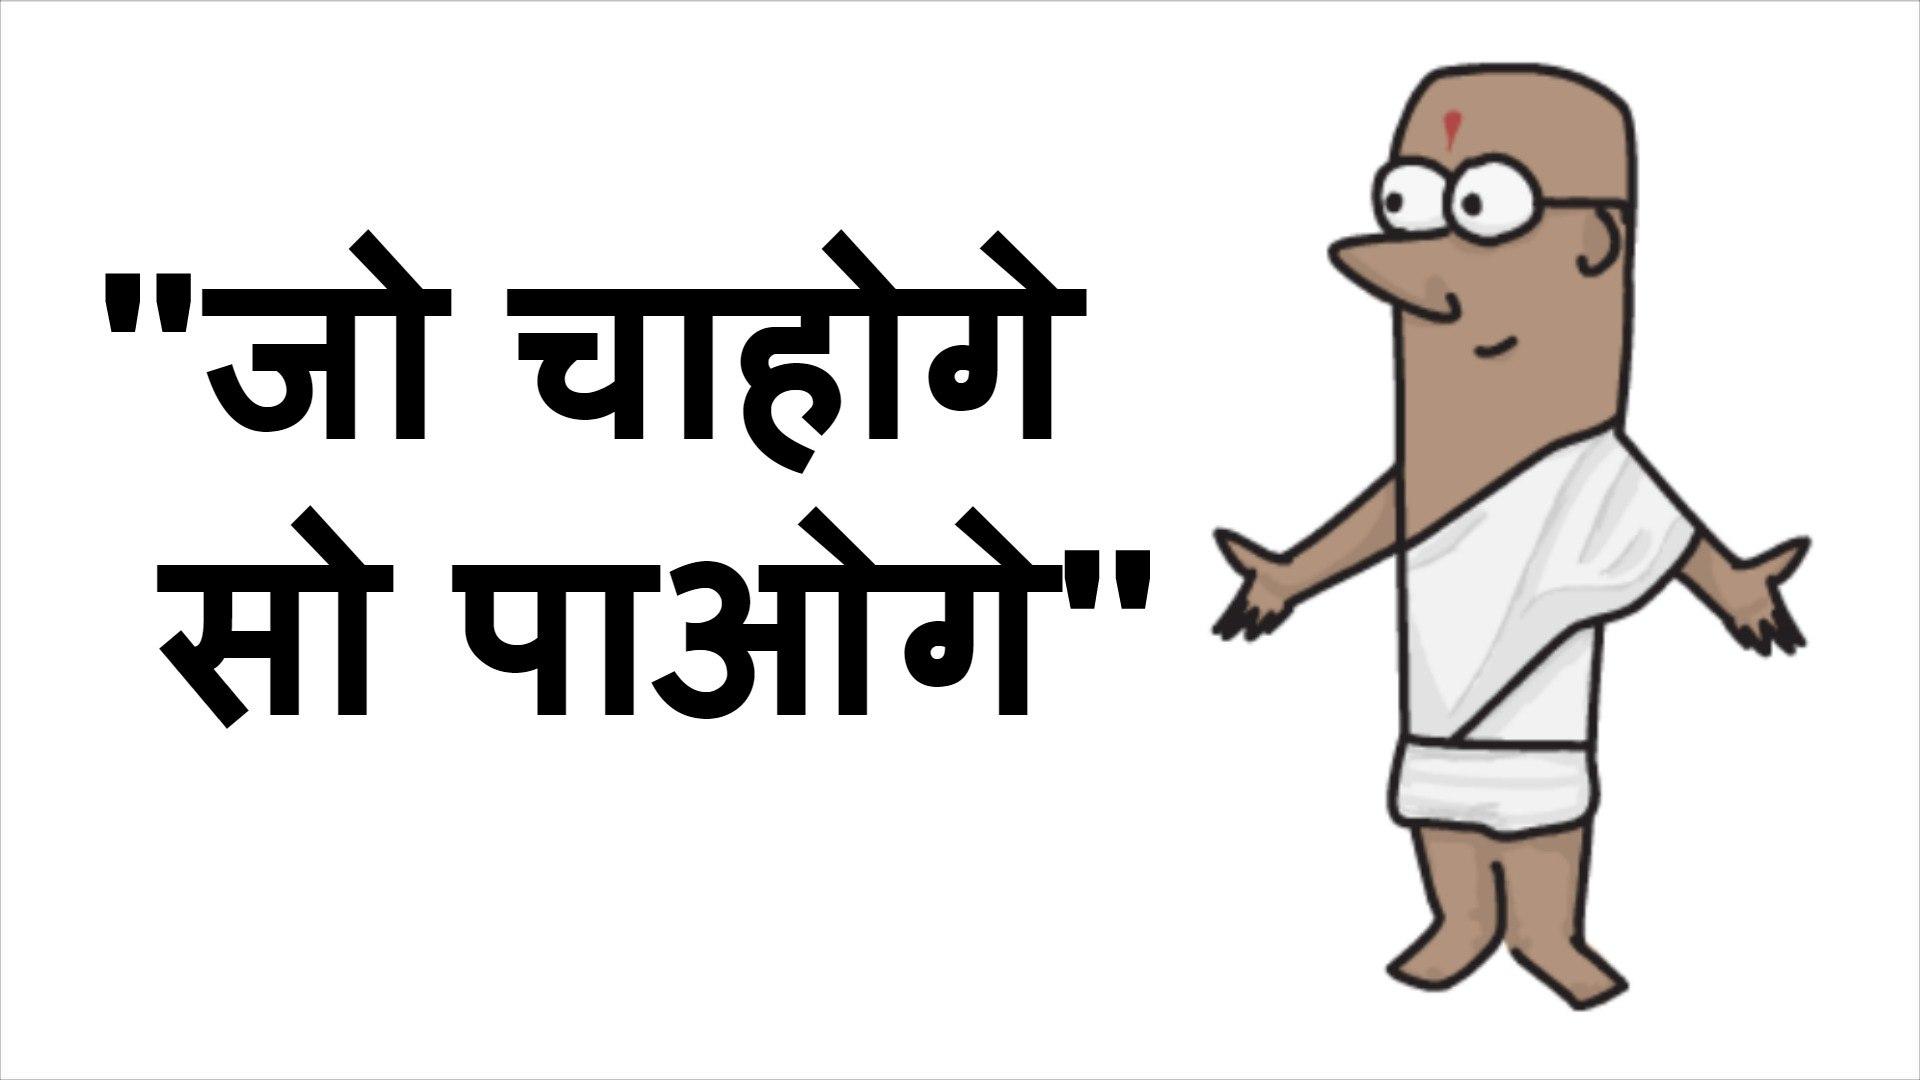 जो चाहोगे सो पाओगे - Animated Motivational Stories for Students in Hindi - Motivational Story - Moti